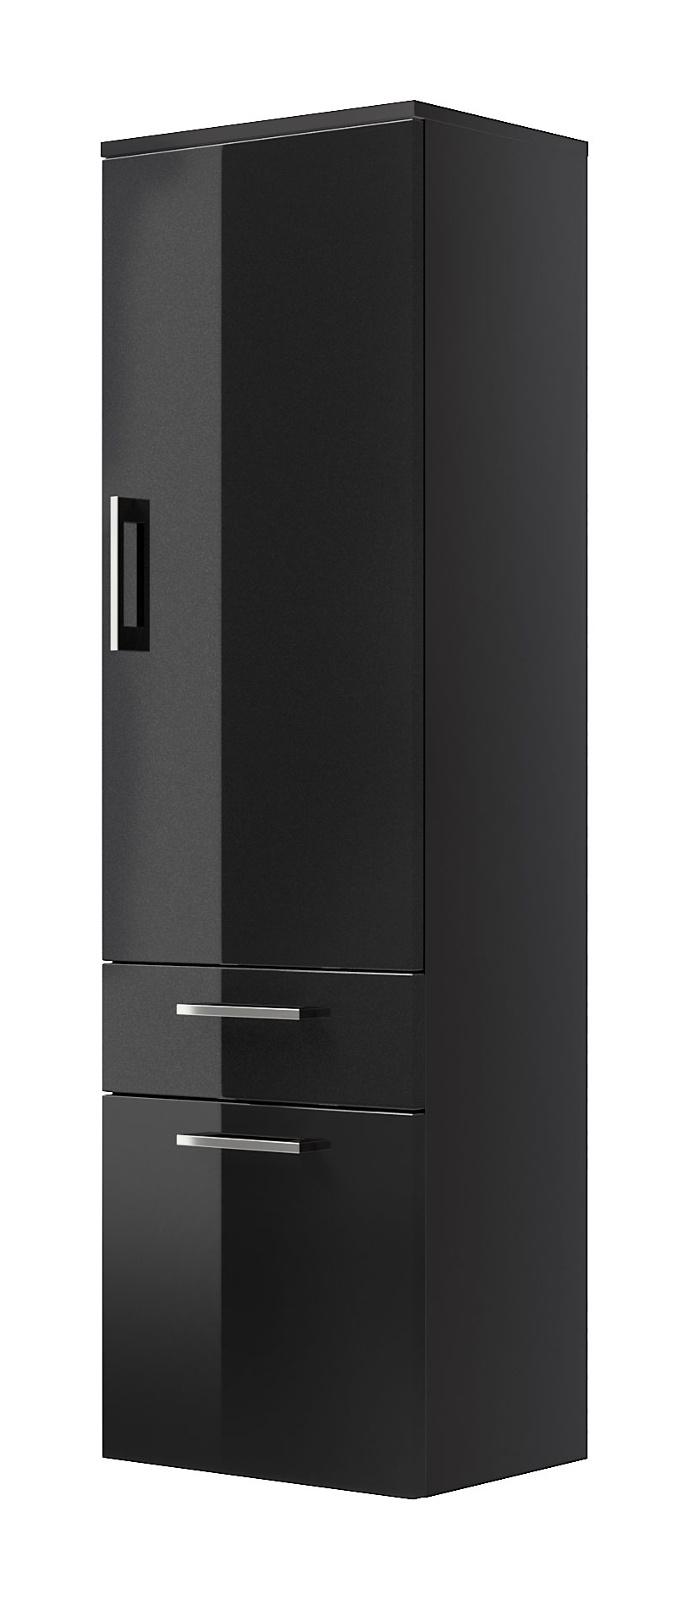 wohnzimmerschrank modern:Wohnzimmerschrank modern : modern Pandaras2 Designermöbel moderne